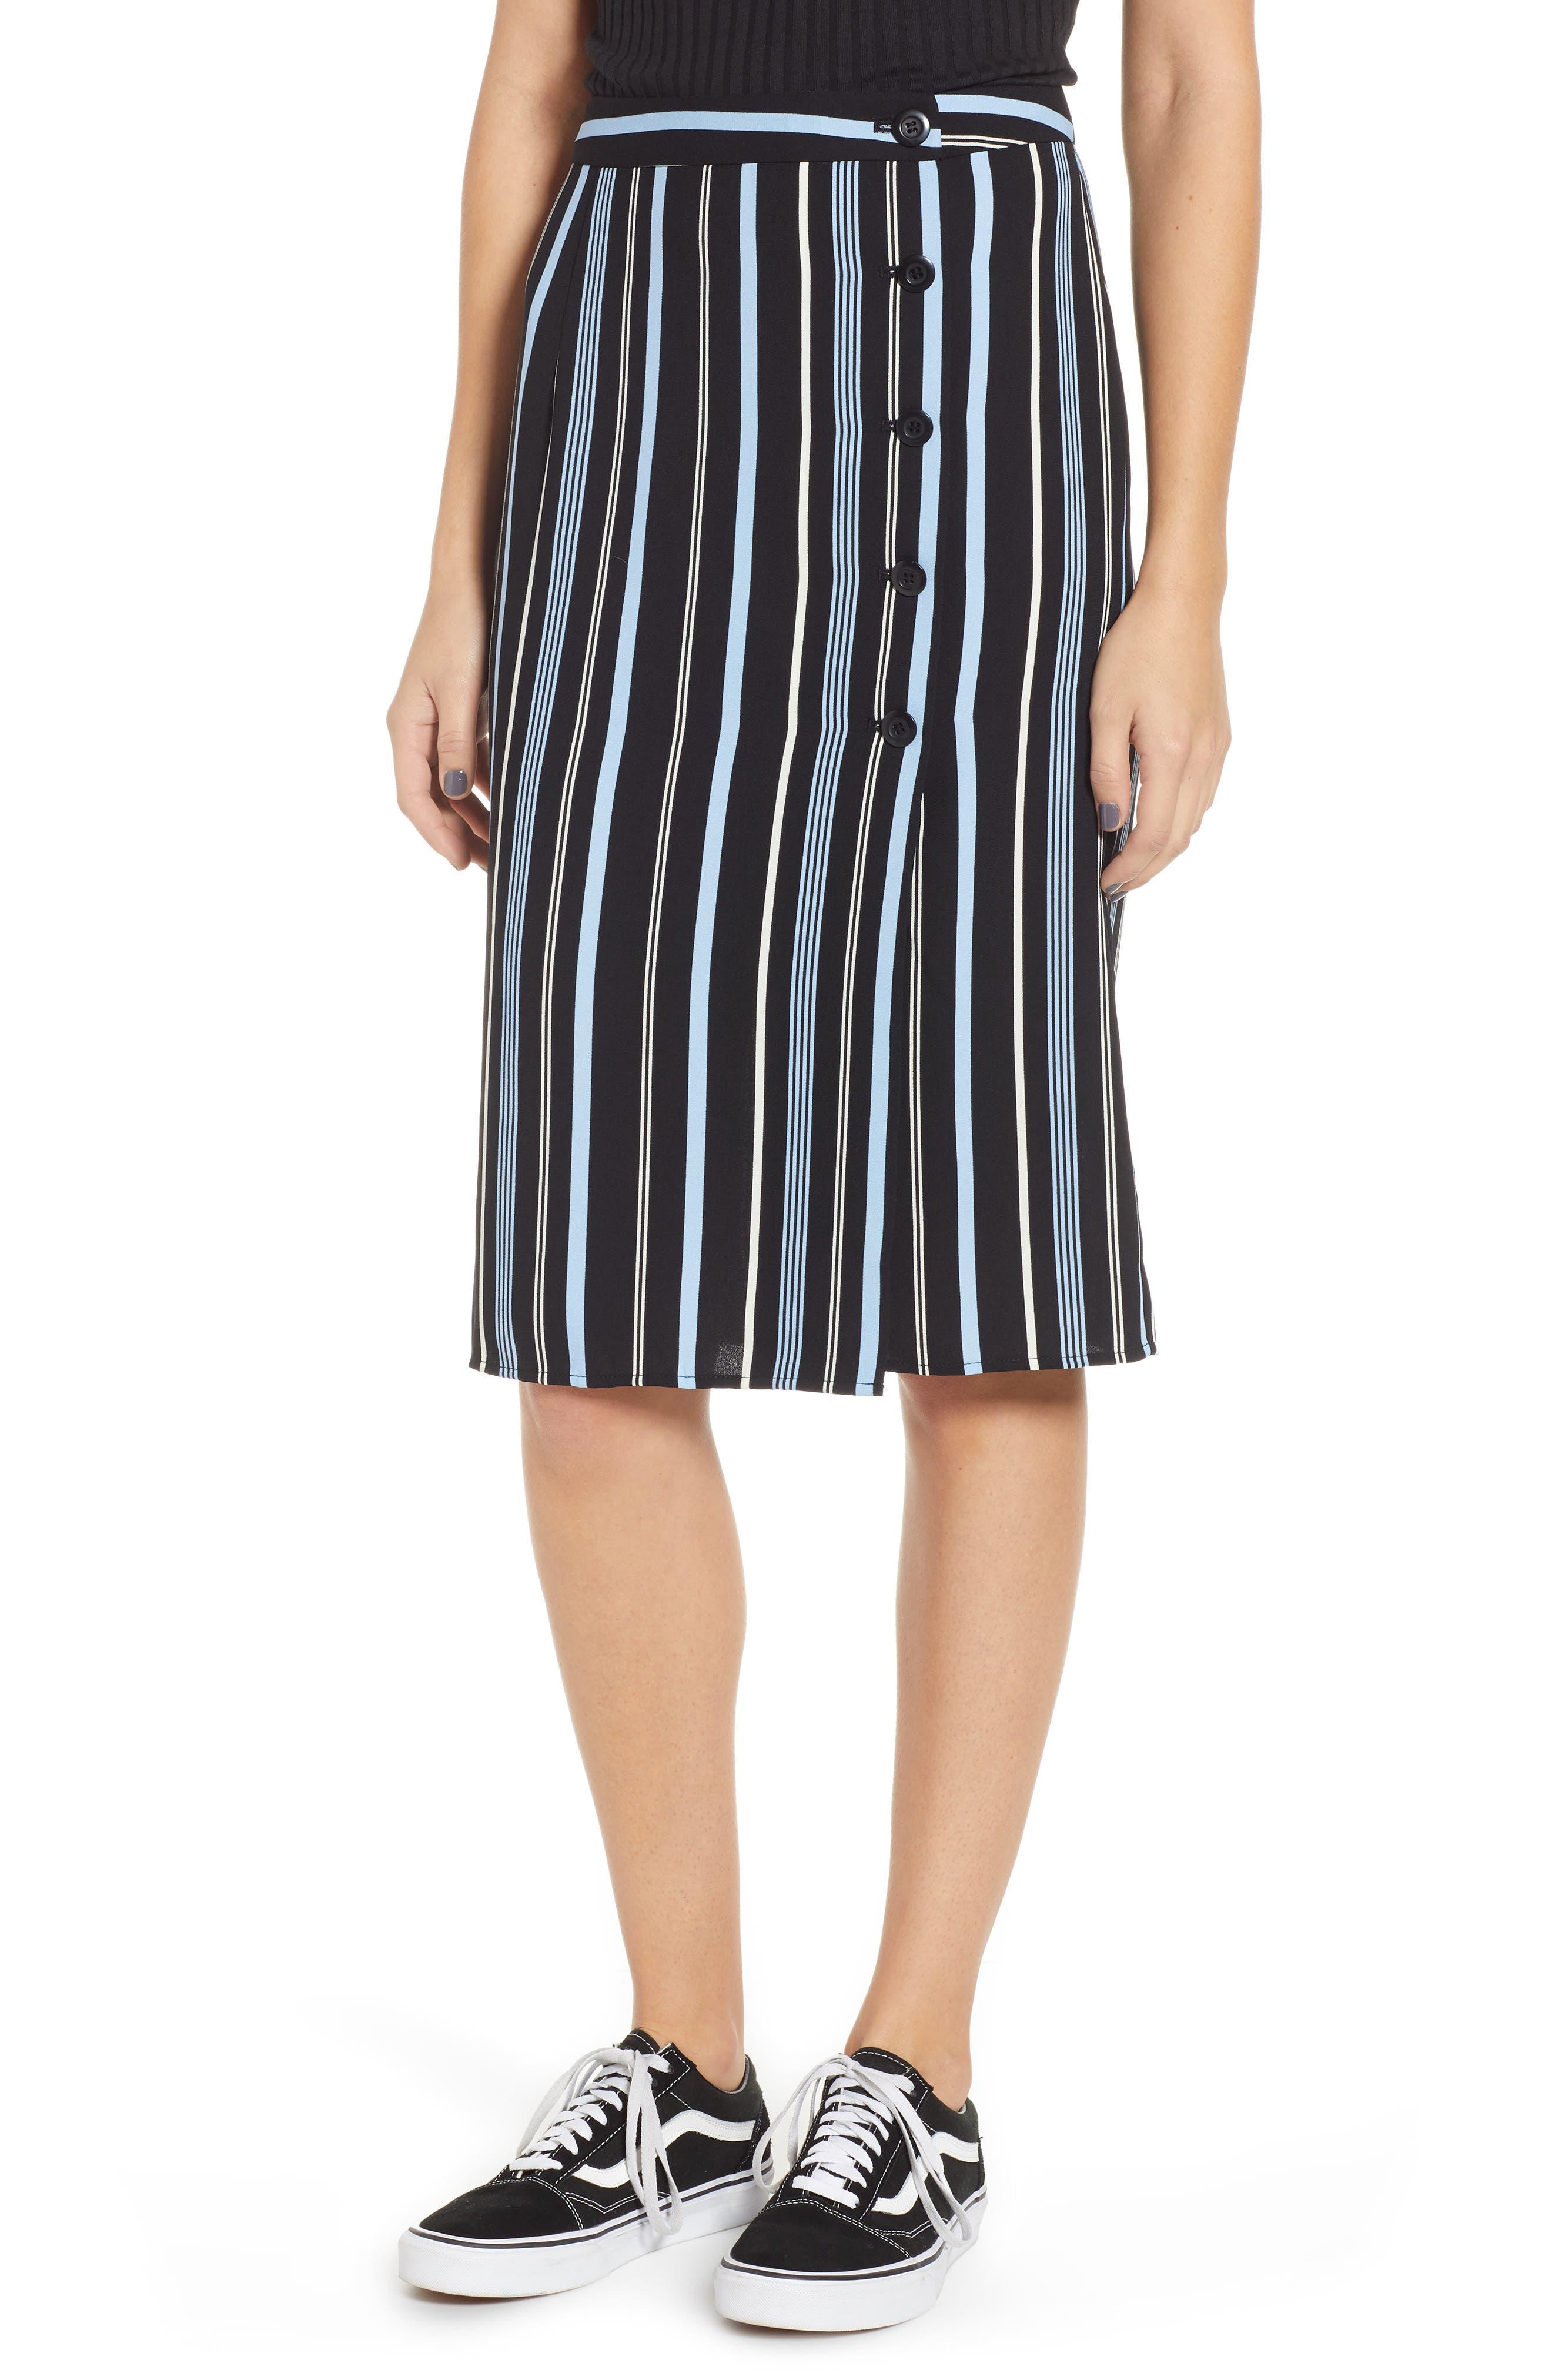 Button Wrap Skirt, Main, color, BLACK MULTI COLORED STRIPE